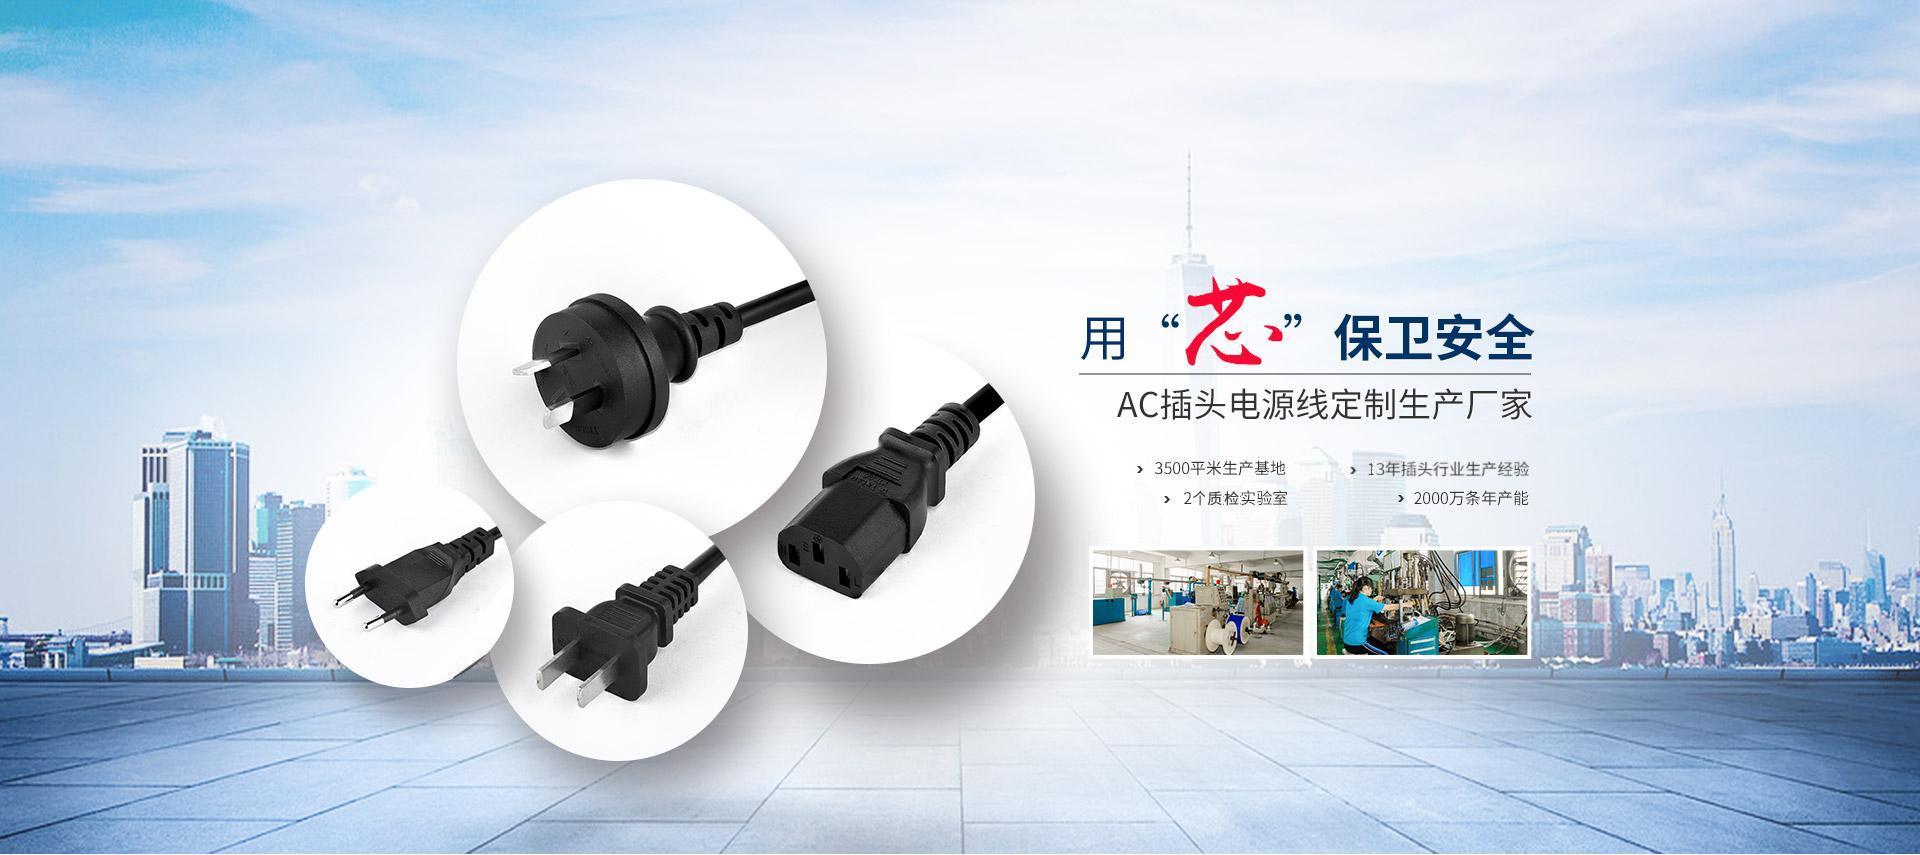 AC插头电源线定制生产厂家-烨达